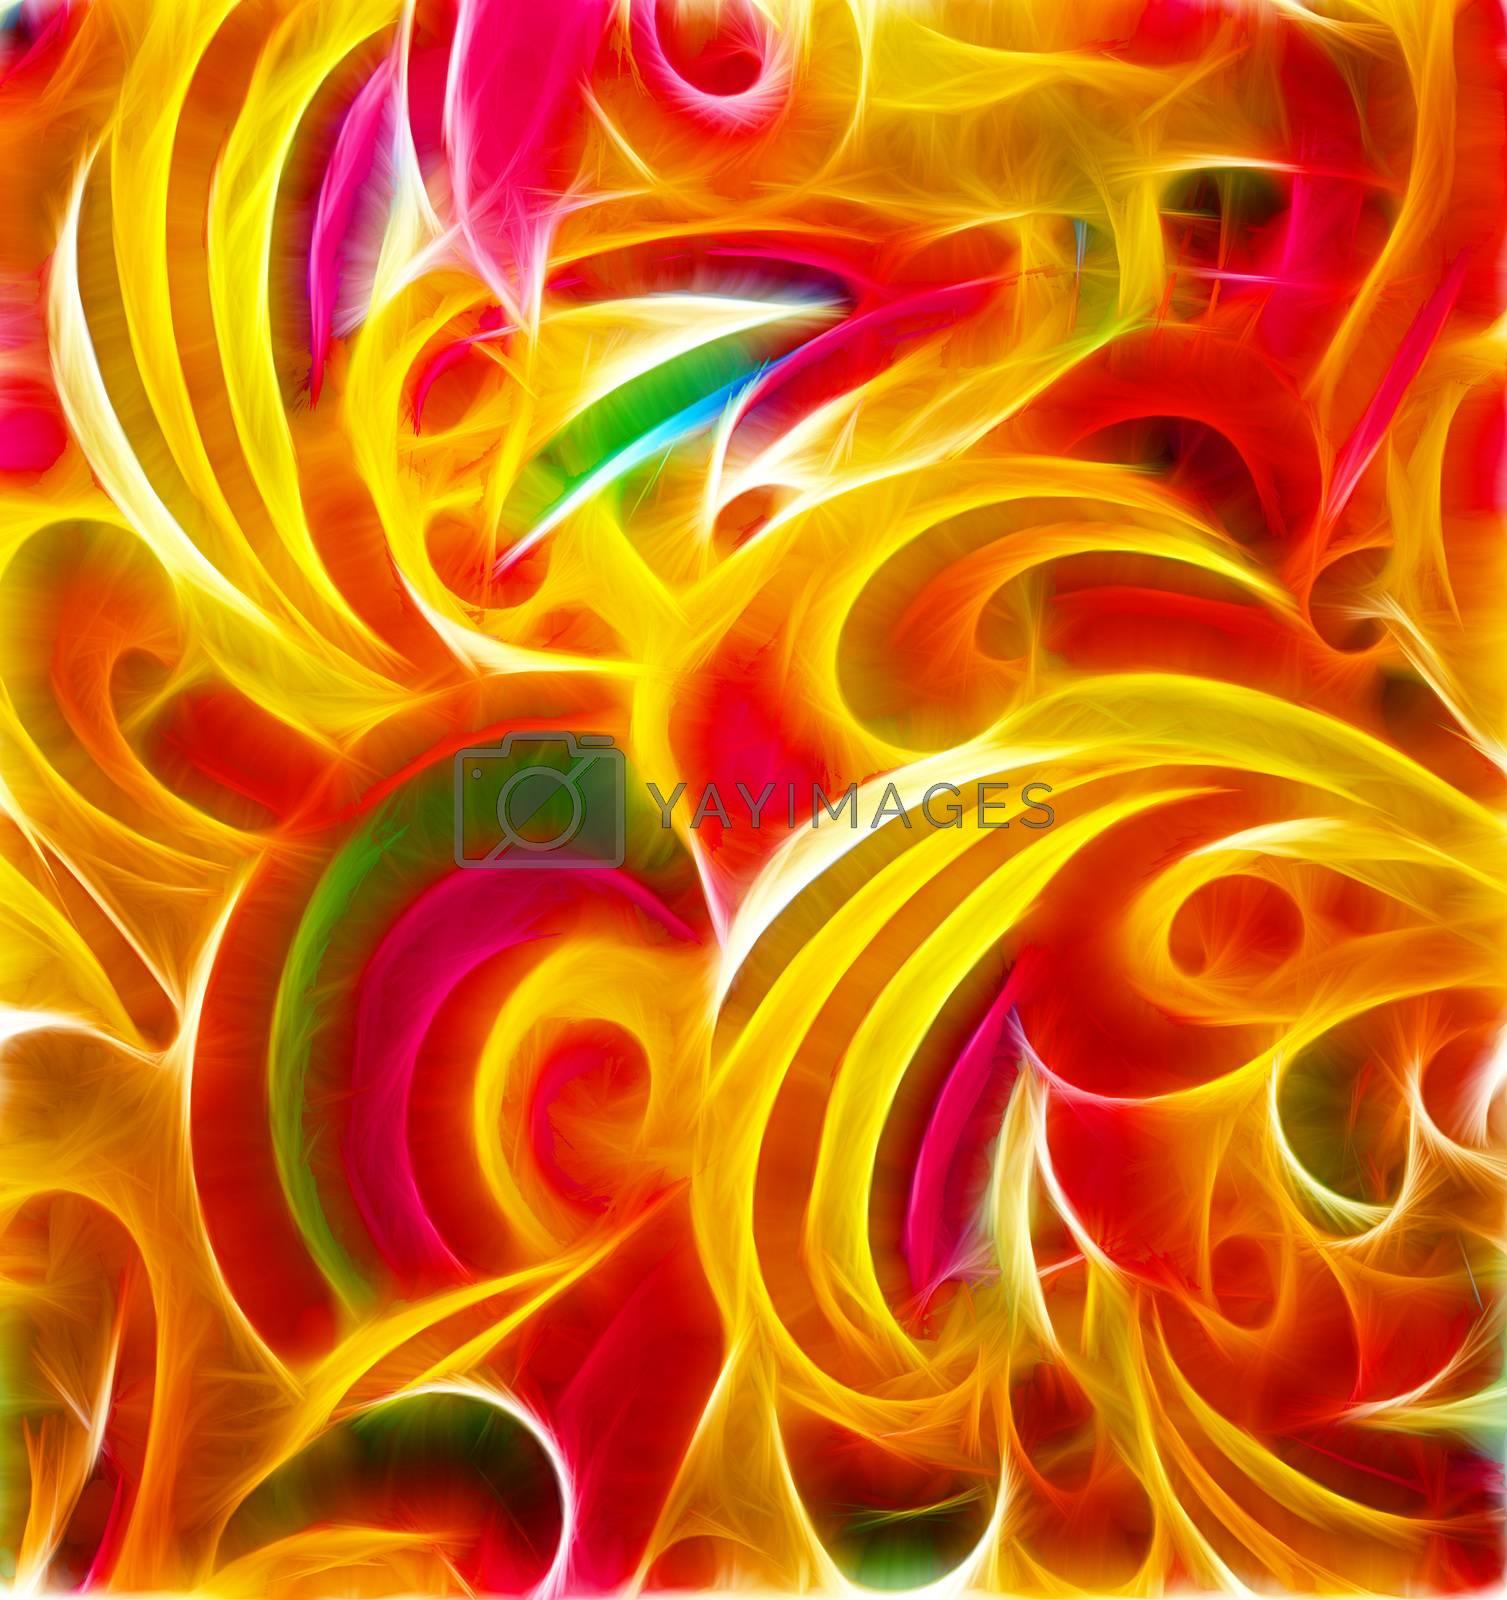 colorful floral curves vintage paper grunge background by CherJu